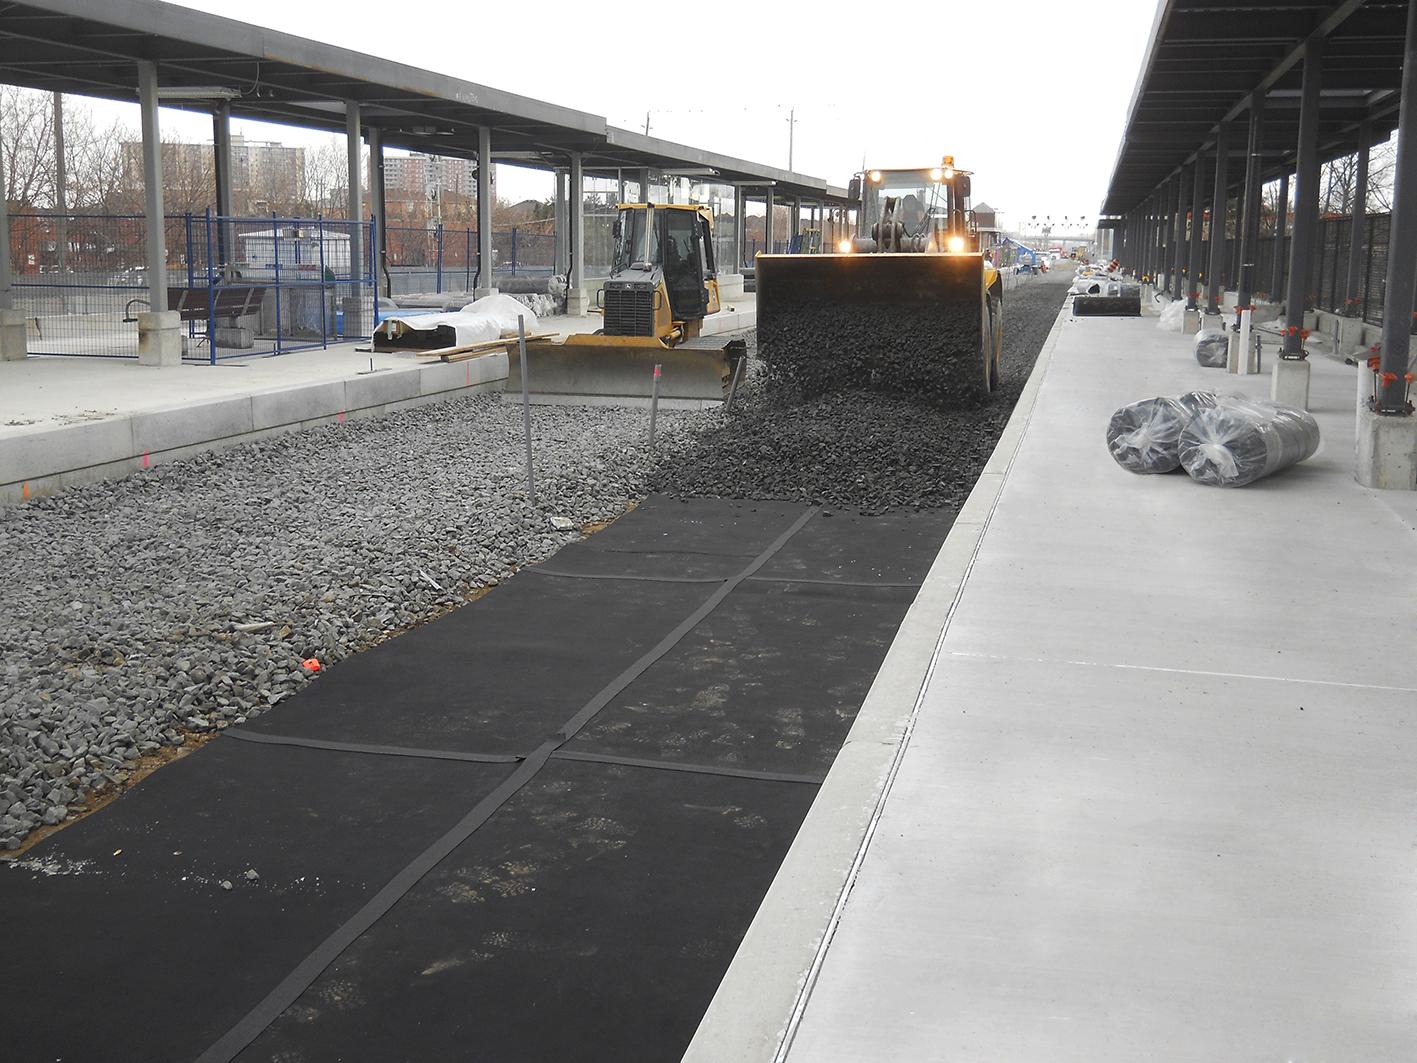 Ballast mats reduce transit vibration